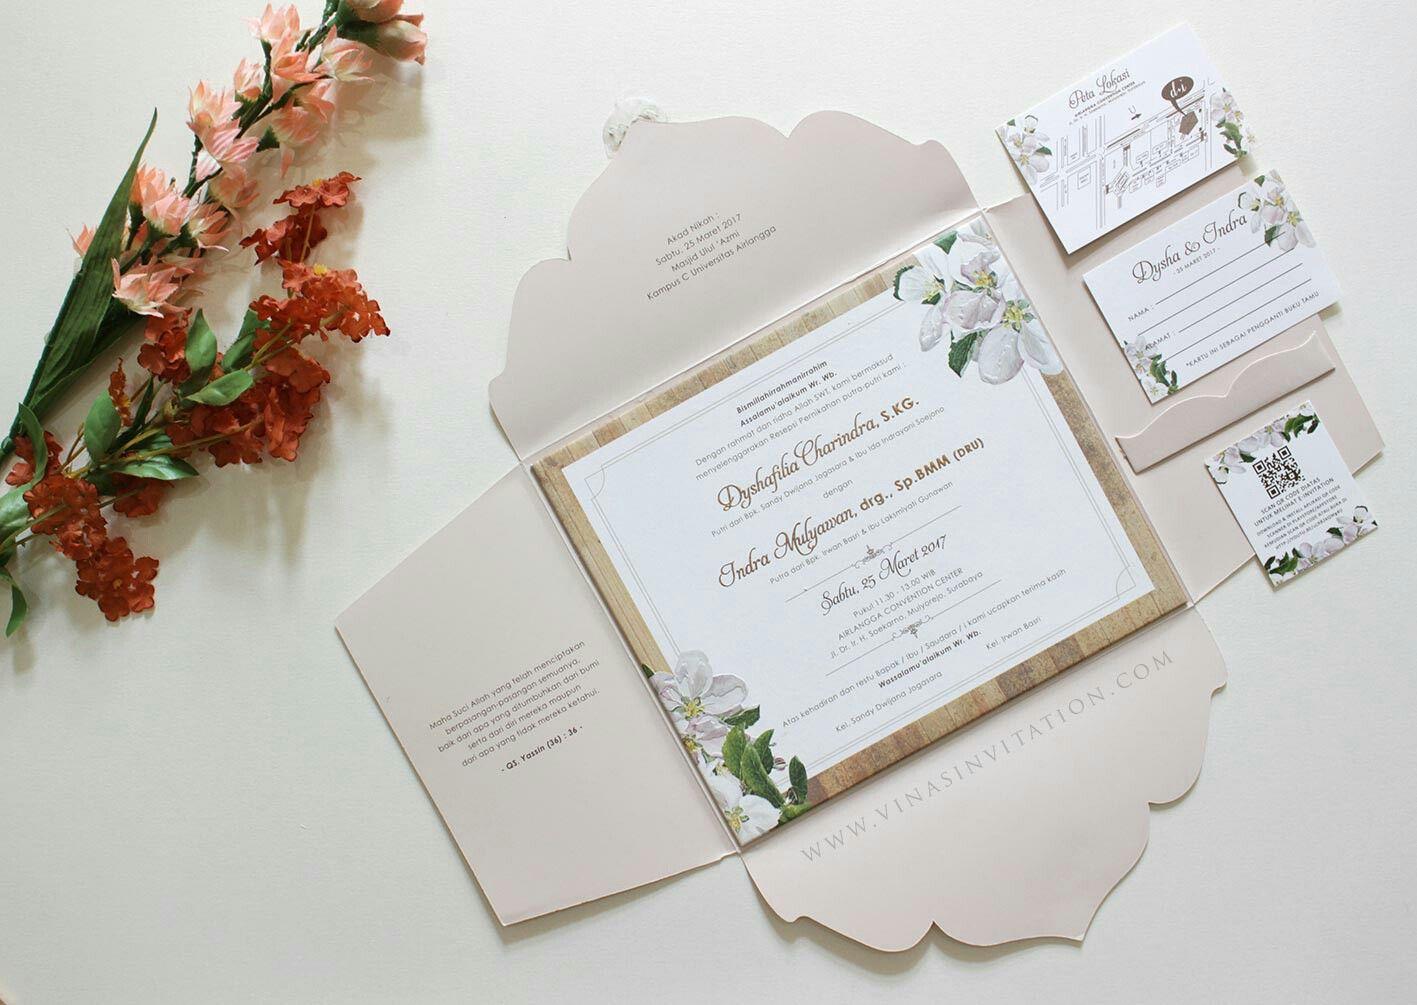 how to emboss wedding invitations diy%0A Vinas invitation  Flower theme invitation  Indonesian wedding   Wedding  invitation   Custom invitation  Emboss flower  Flower theme  Classic flower